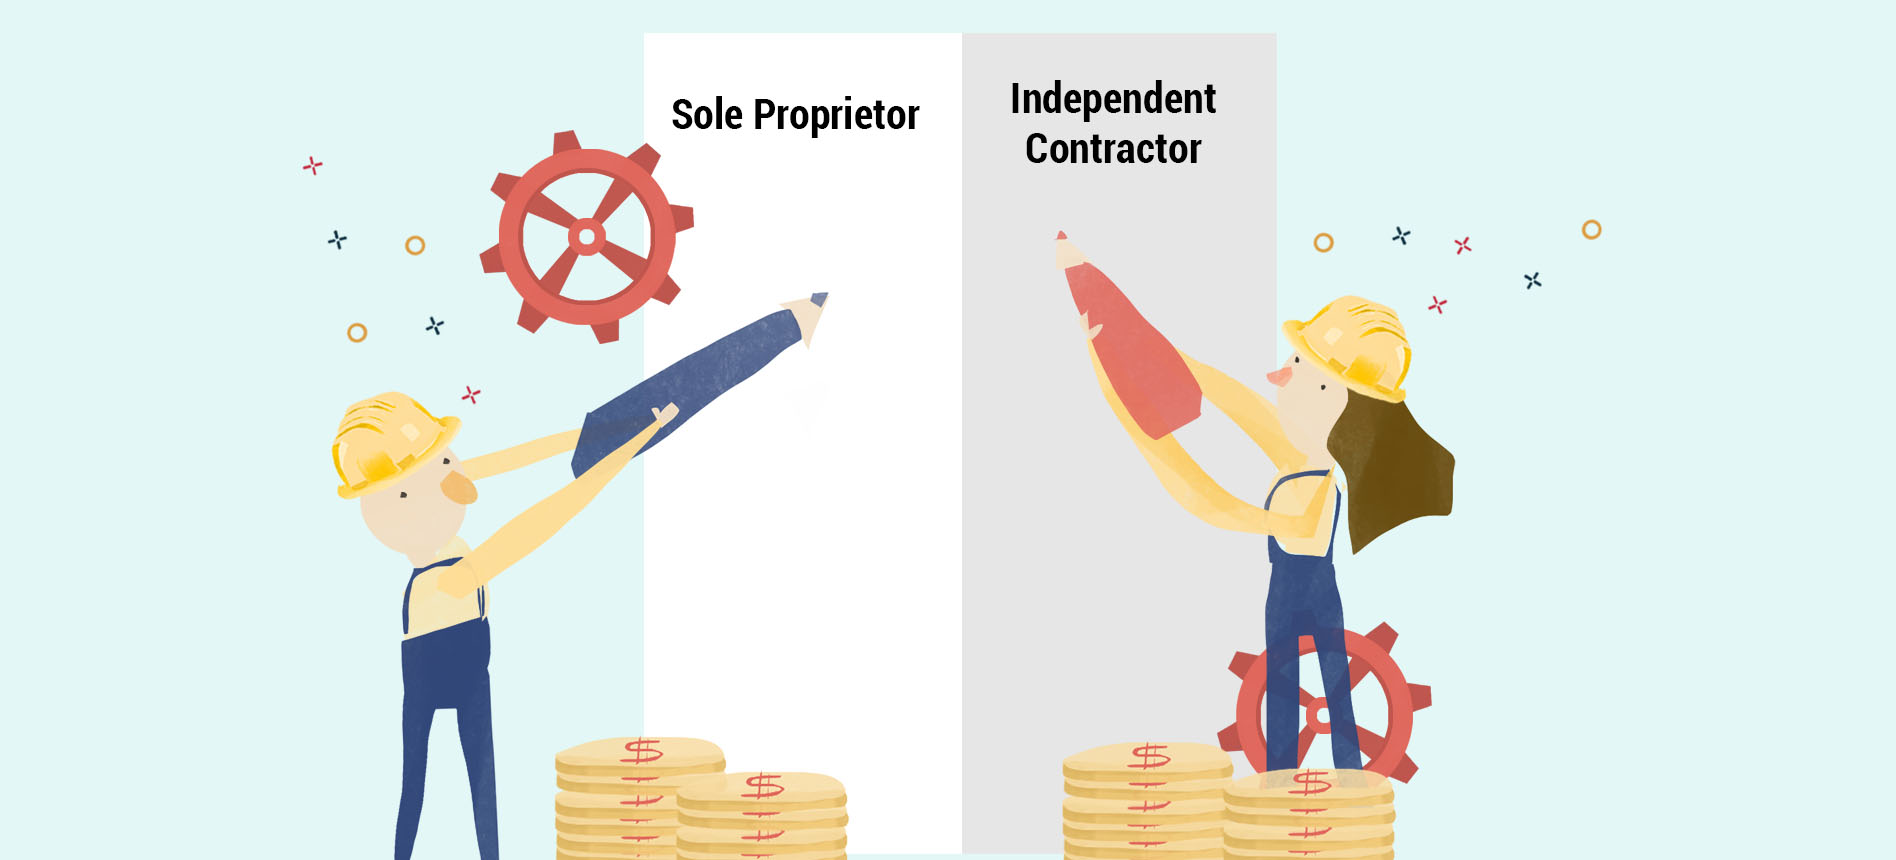 Sole Proprietor vs Independent Contractor